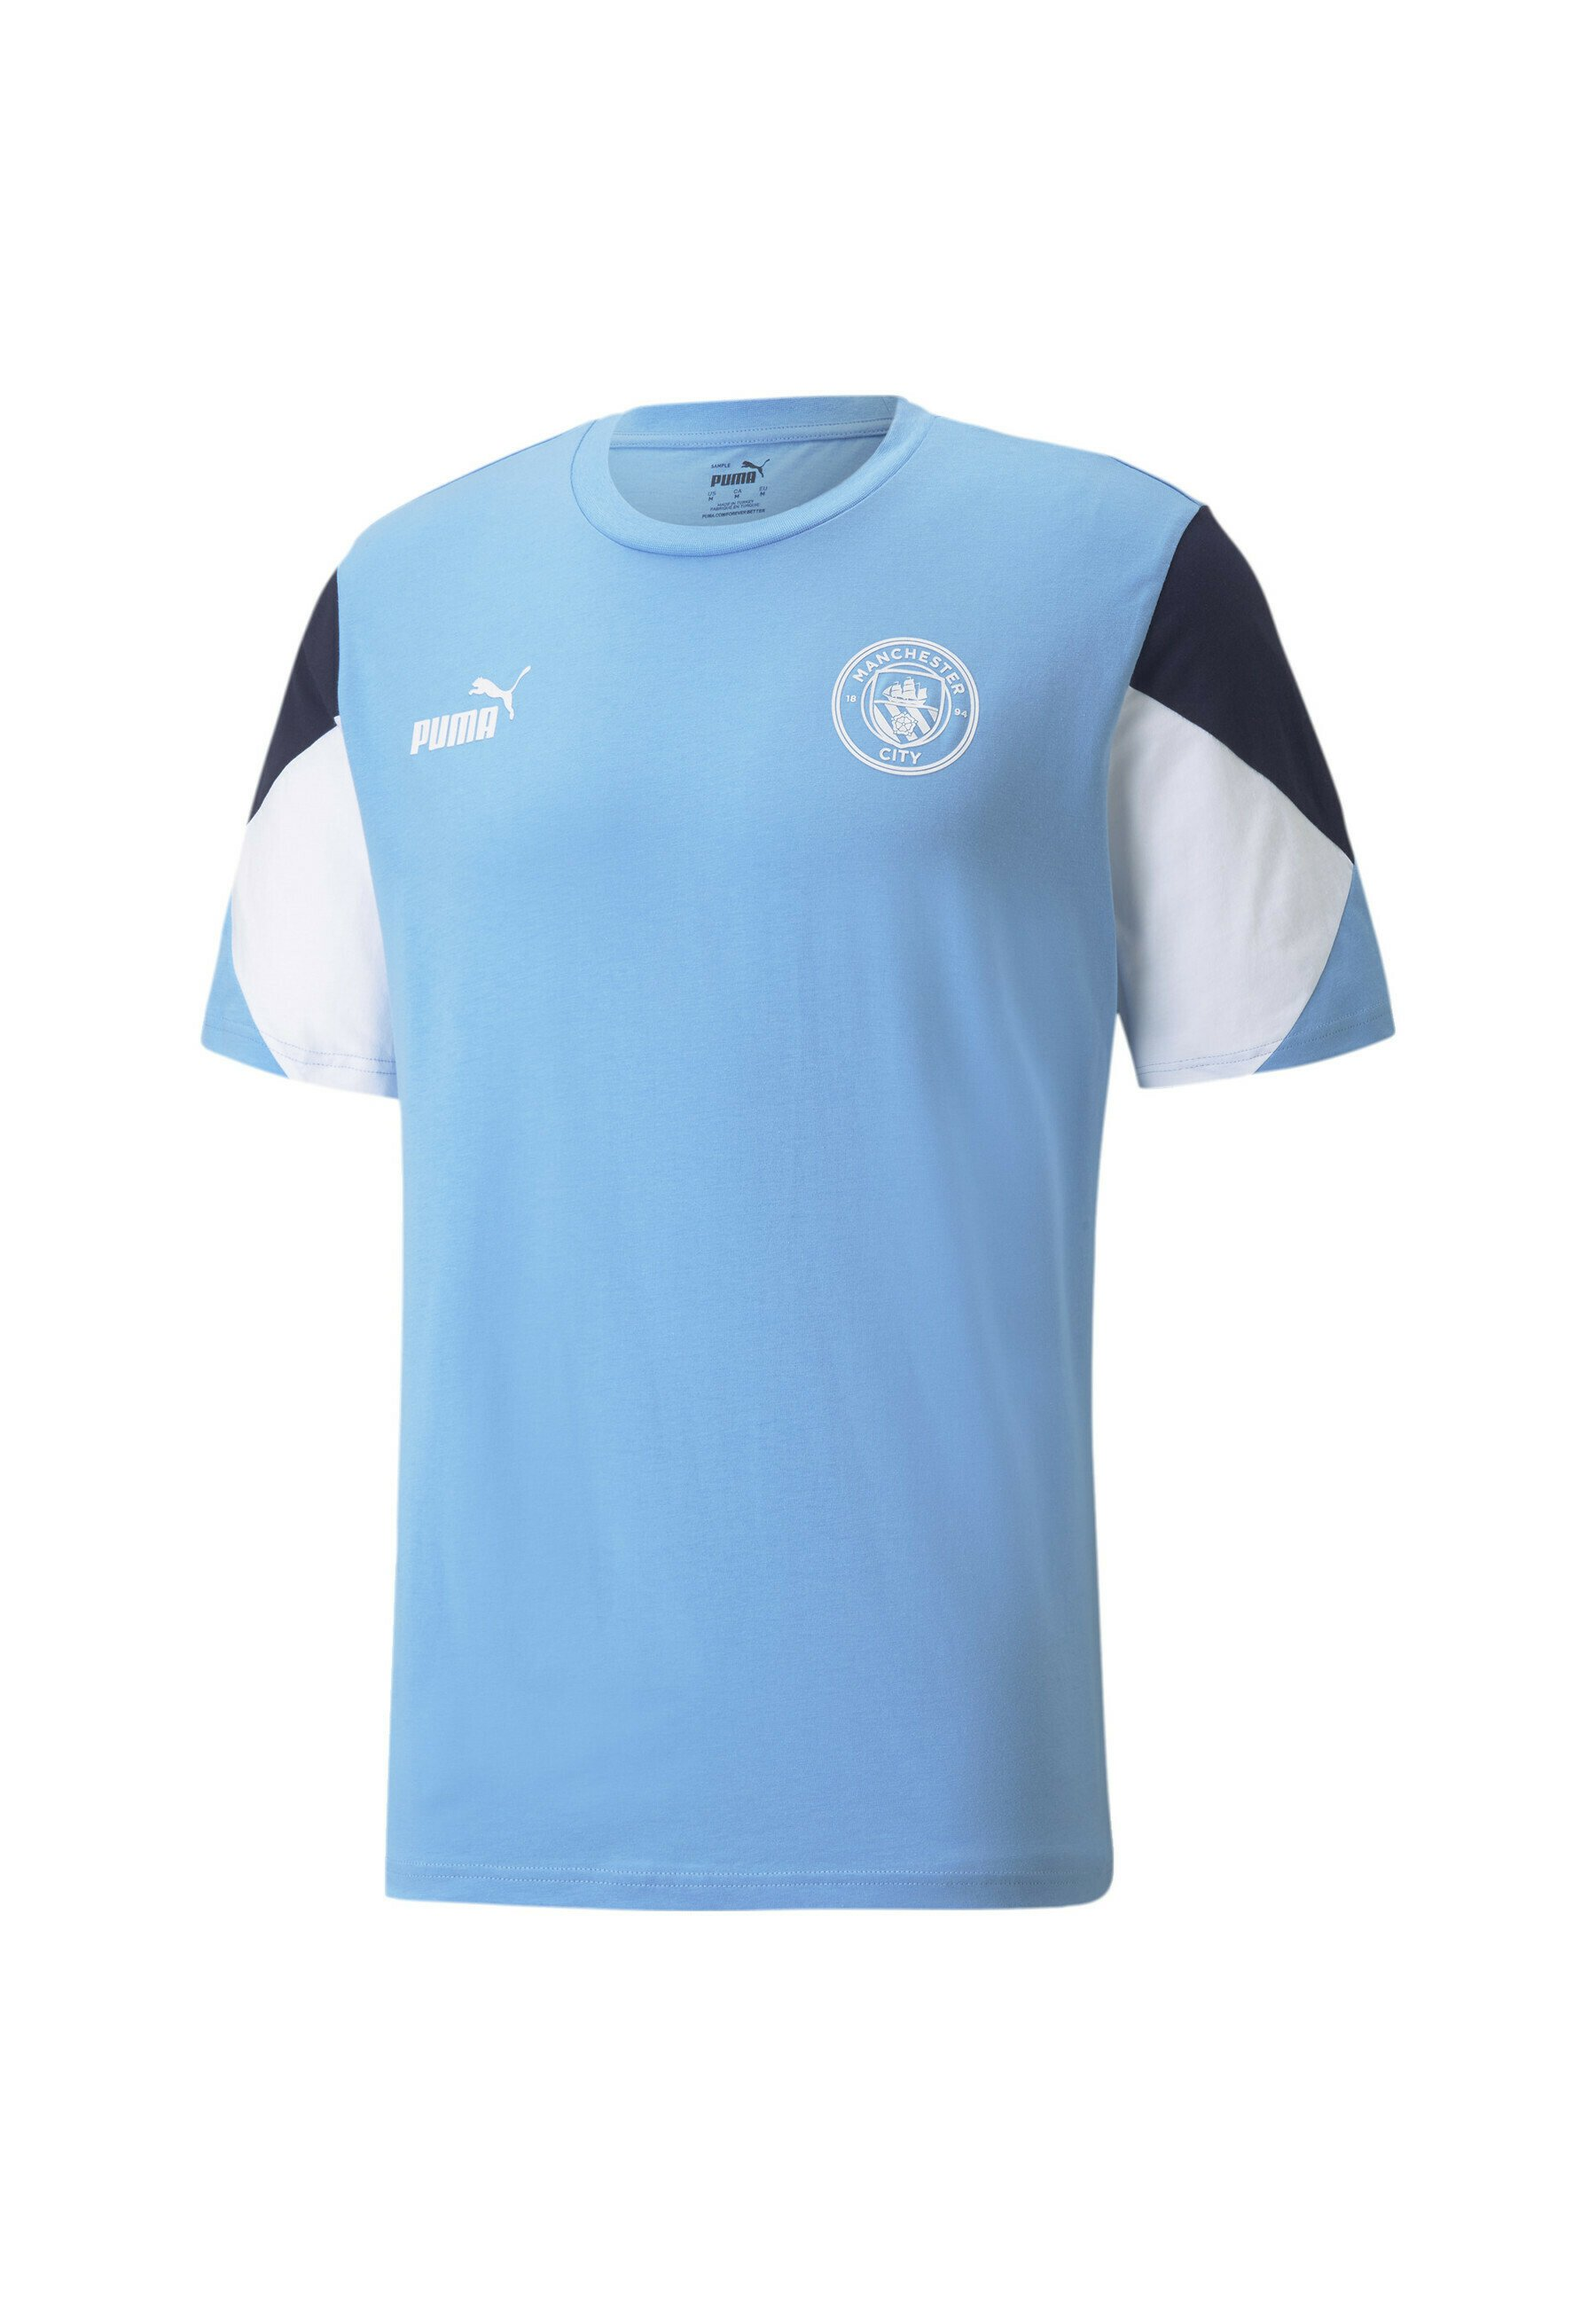 Uomo FTBLCULTURE FOOTBALL TEE - MAN CITY  - T-shirt sportiva